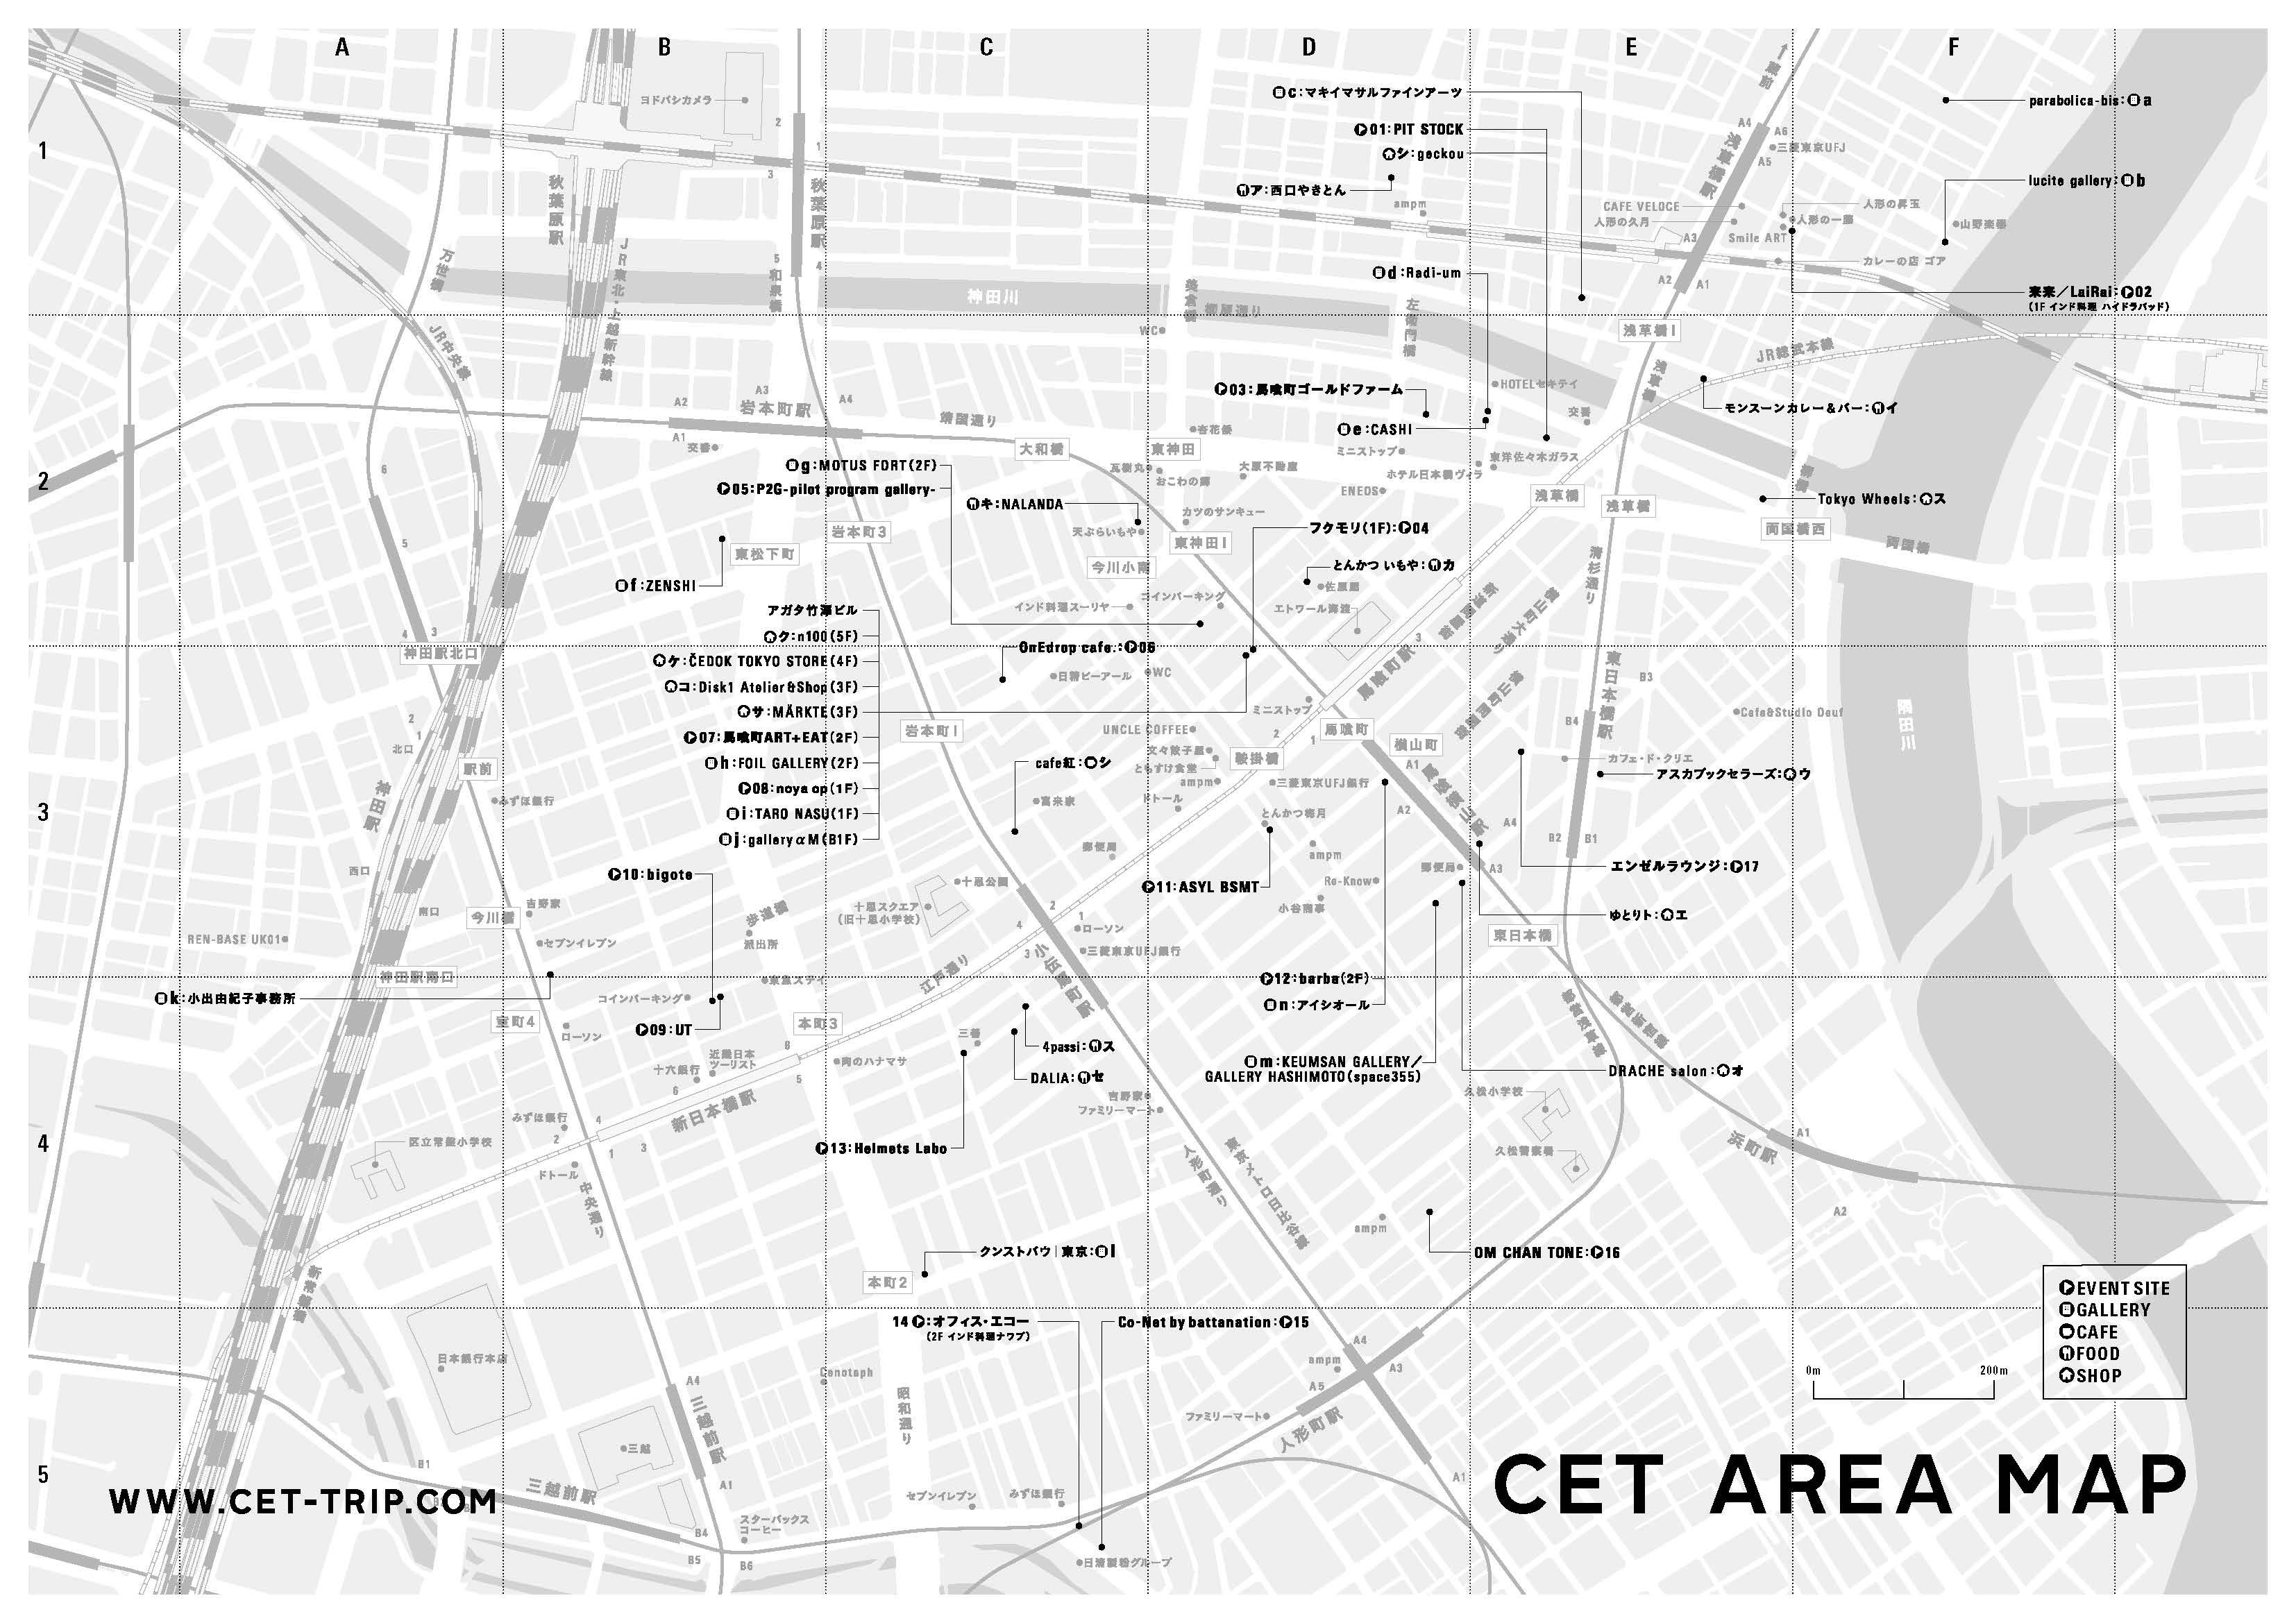 http://ud.t.u-tokyo.ac.jp/blog/_images/CET_TRIP_2010_MAP.jpg